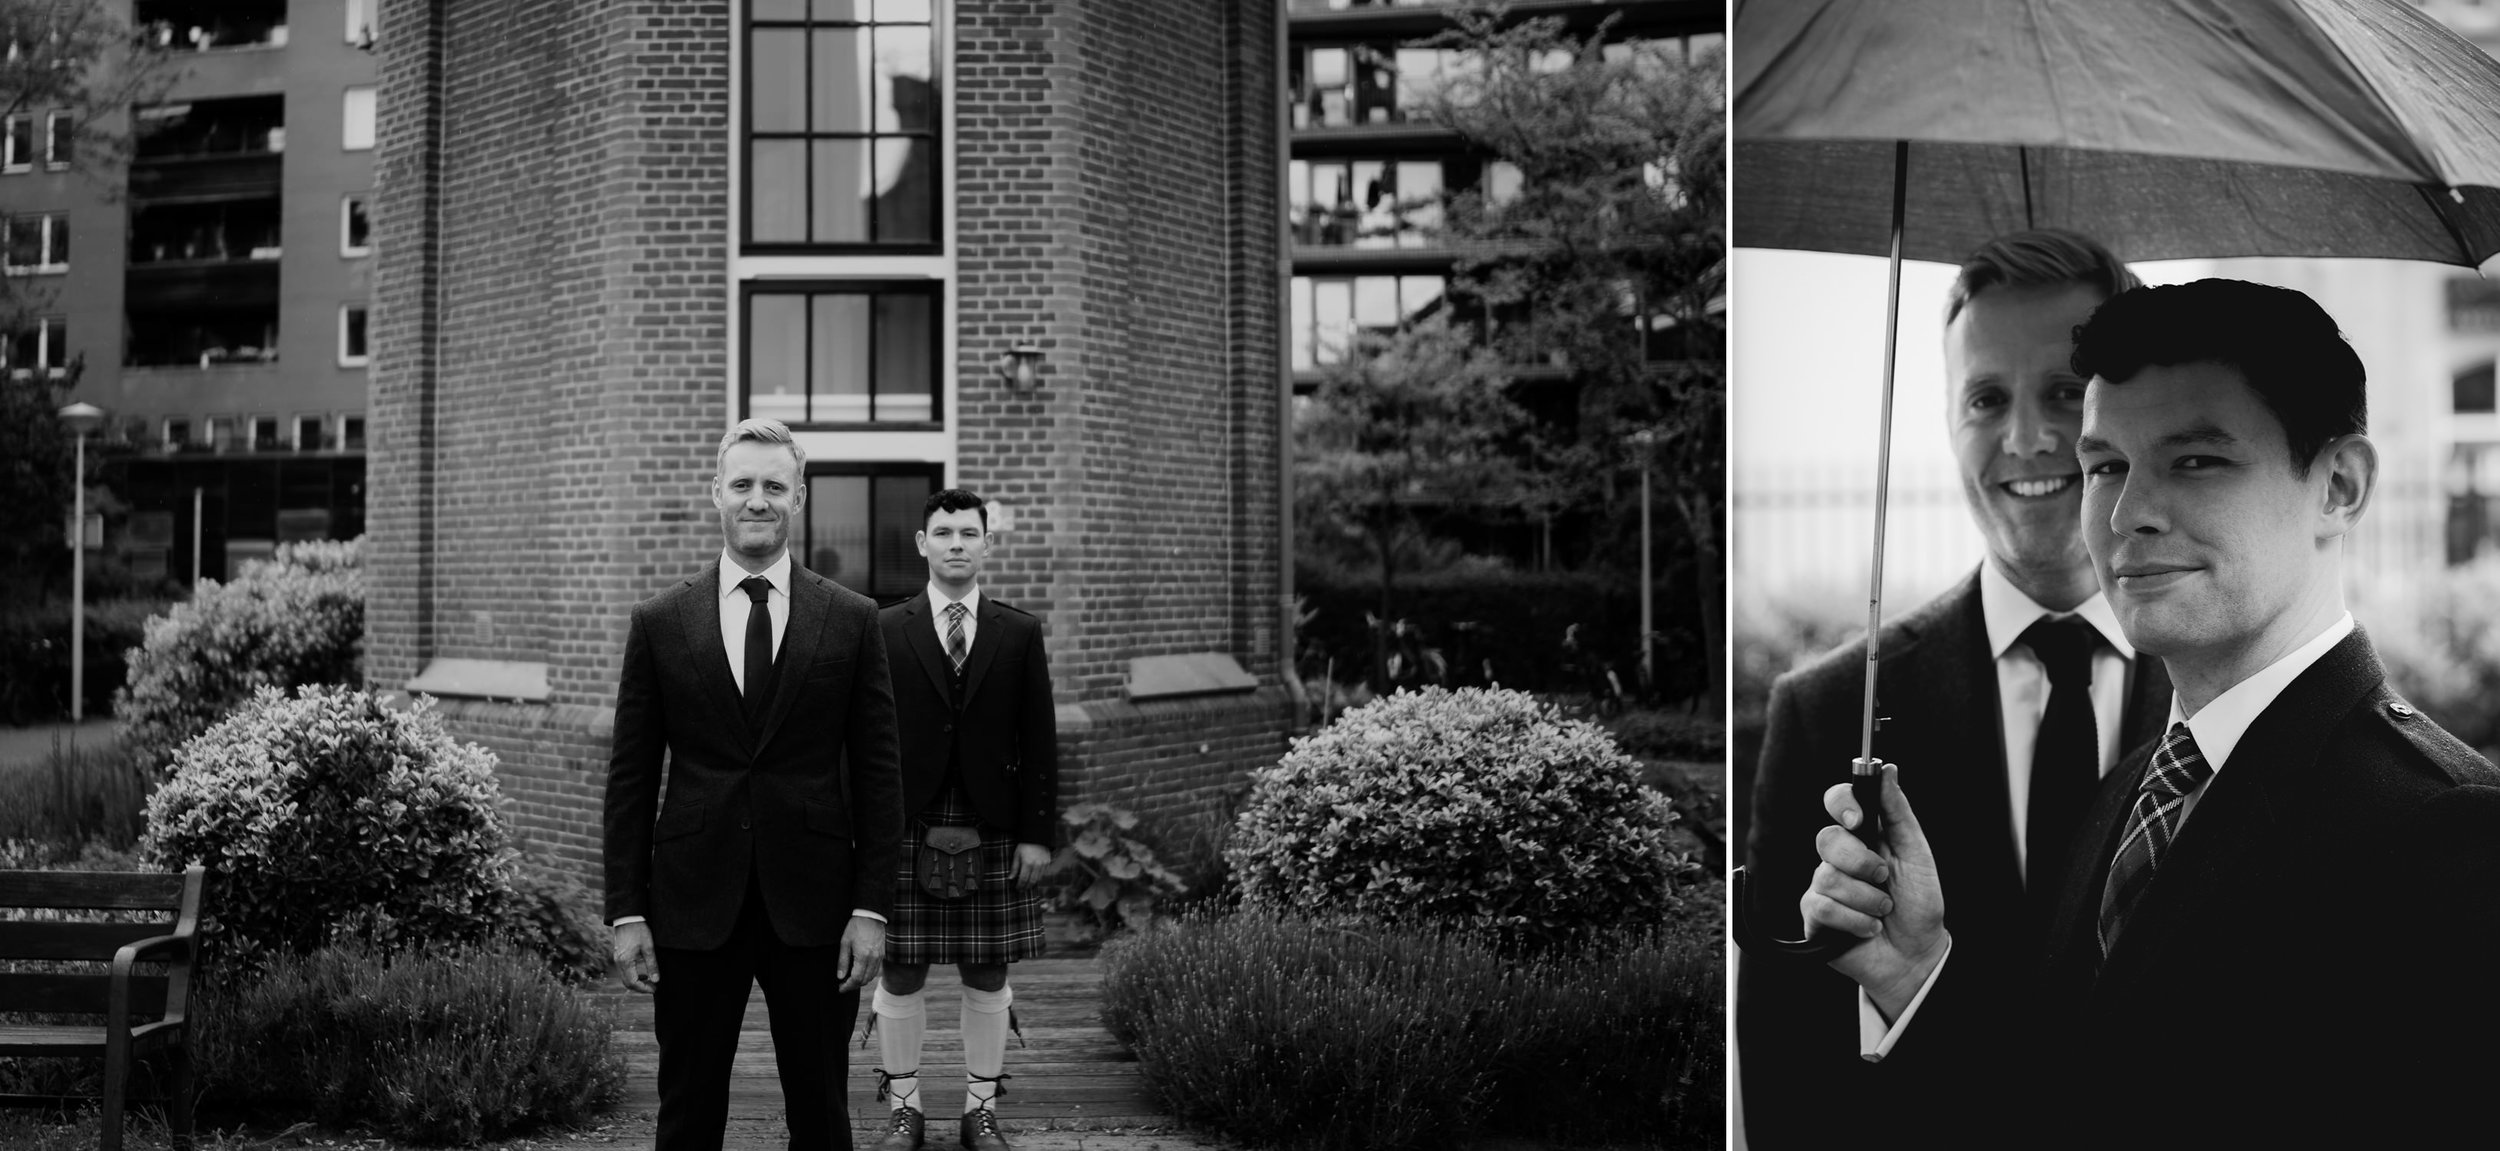 amsterdam-wedding-photographer-trouwfotograaf-bruidsfotograaf-mark-hadden-bruidsfotografie-David & Ronald-004-2 copy.jpg